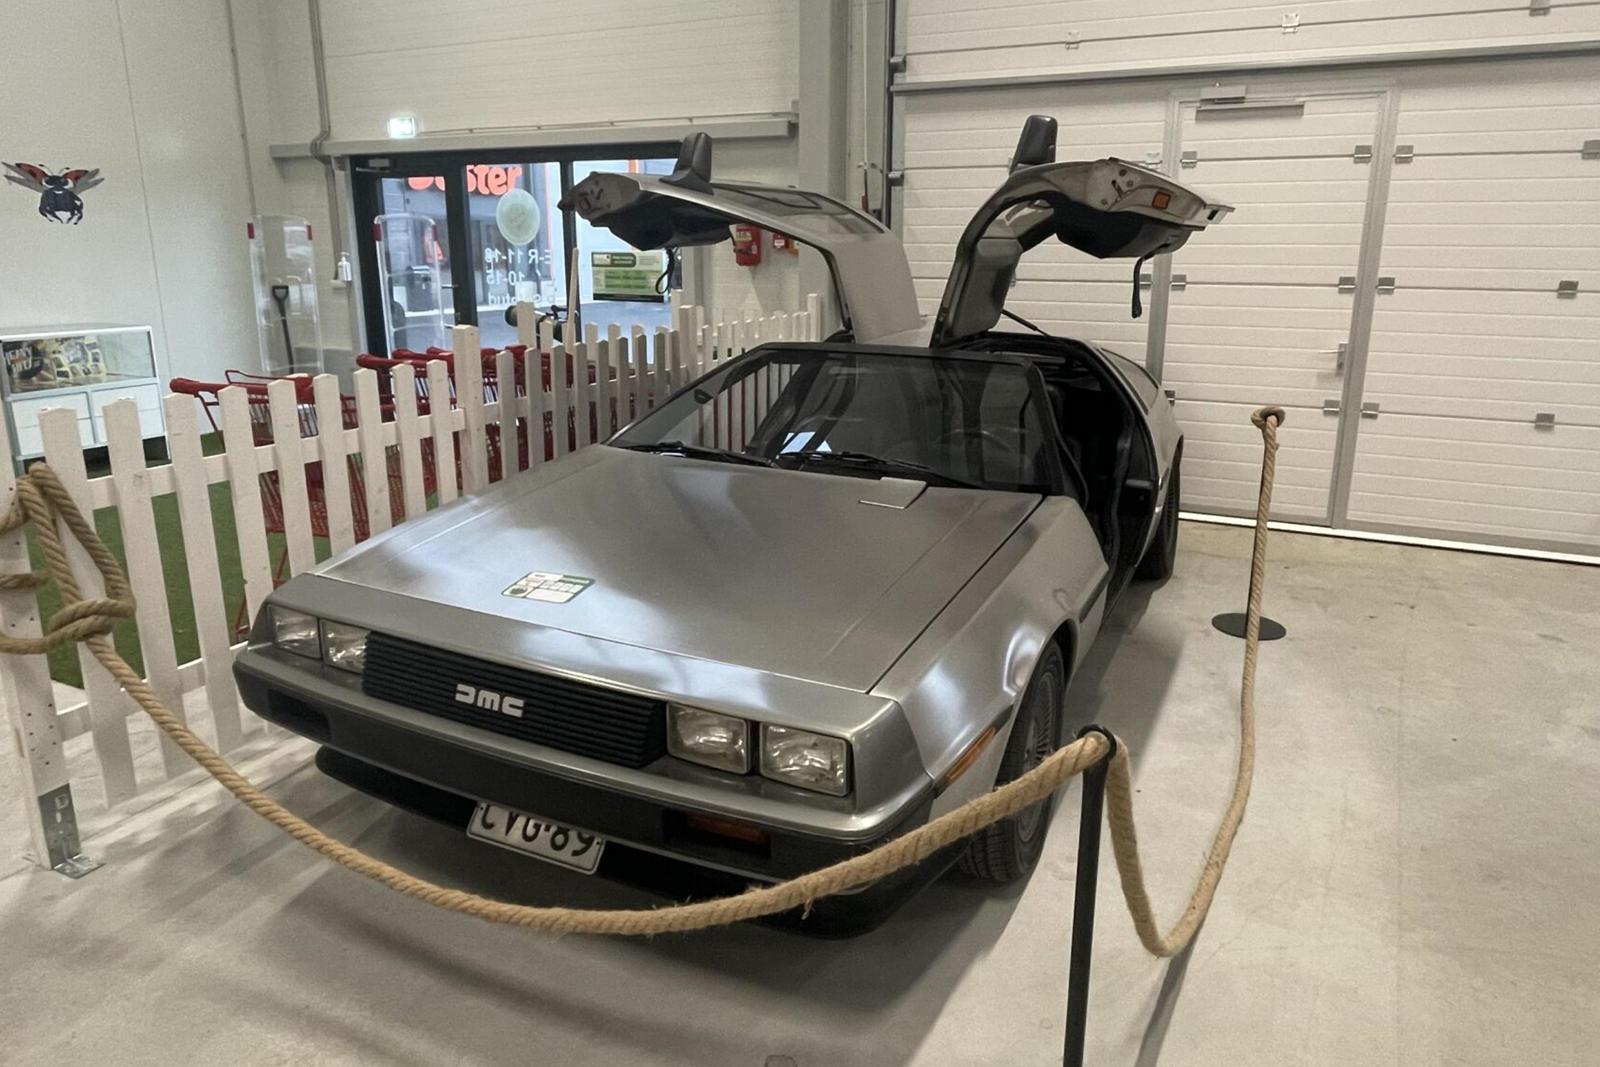 Estonian Thrift Store Selling DMC DeLorean For $65,000